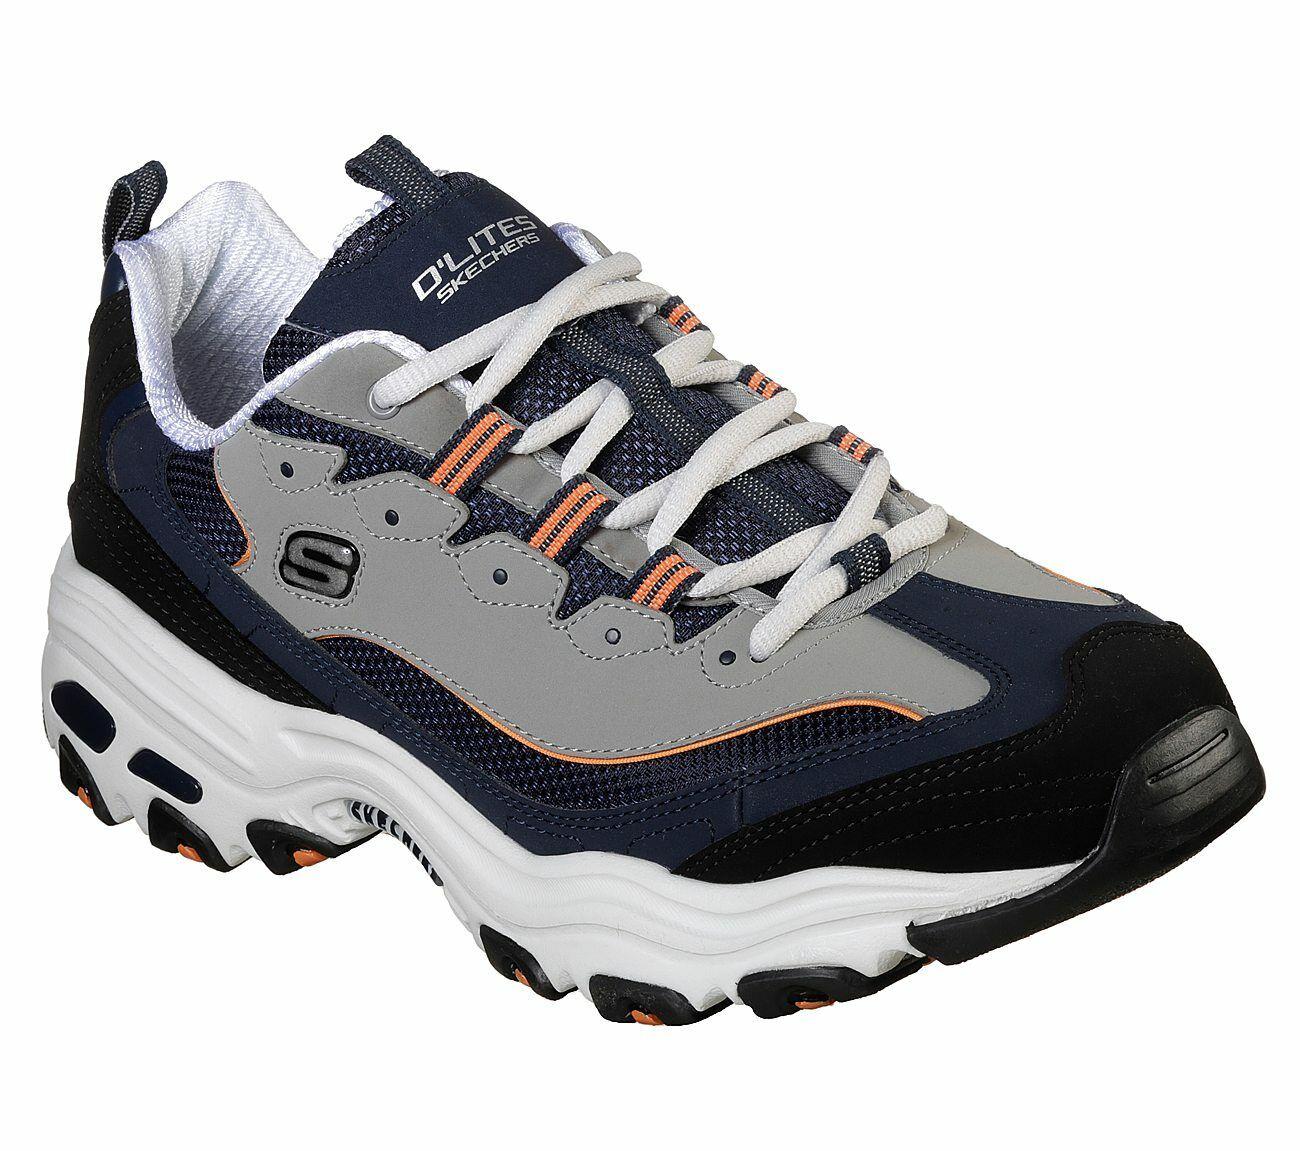 marca Skechers Skechers Skechers Dlites Navy scarpe Uomo Memory Foam Sport Comfort Casual Train Walk 52675  liquidazione